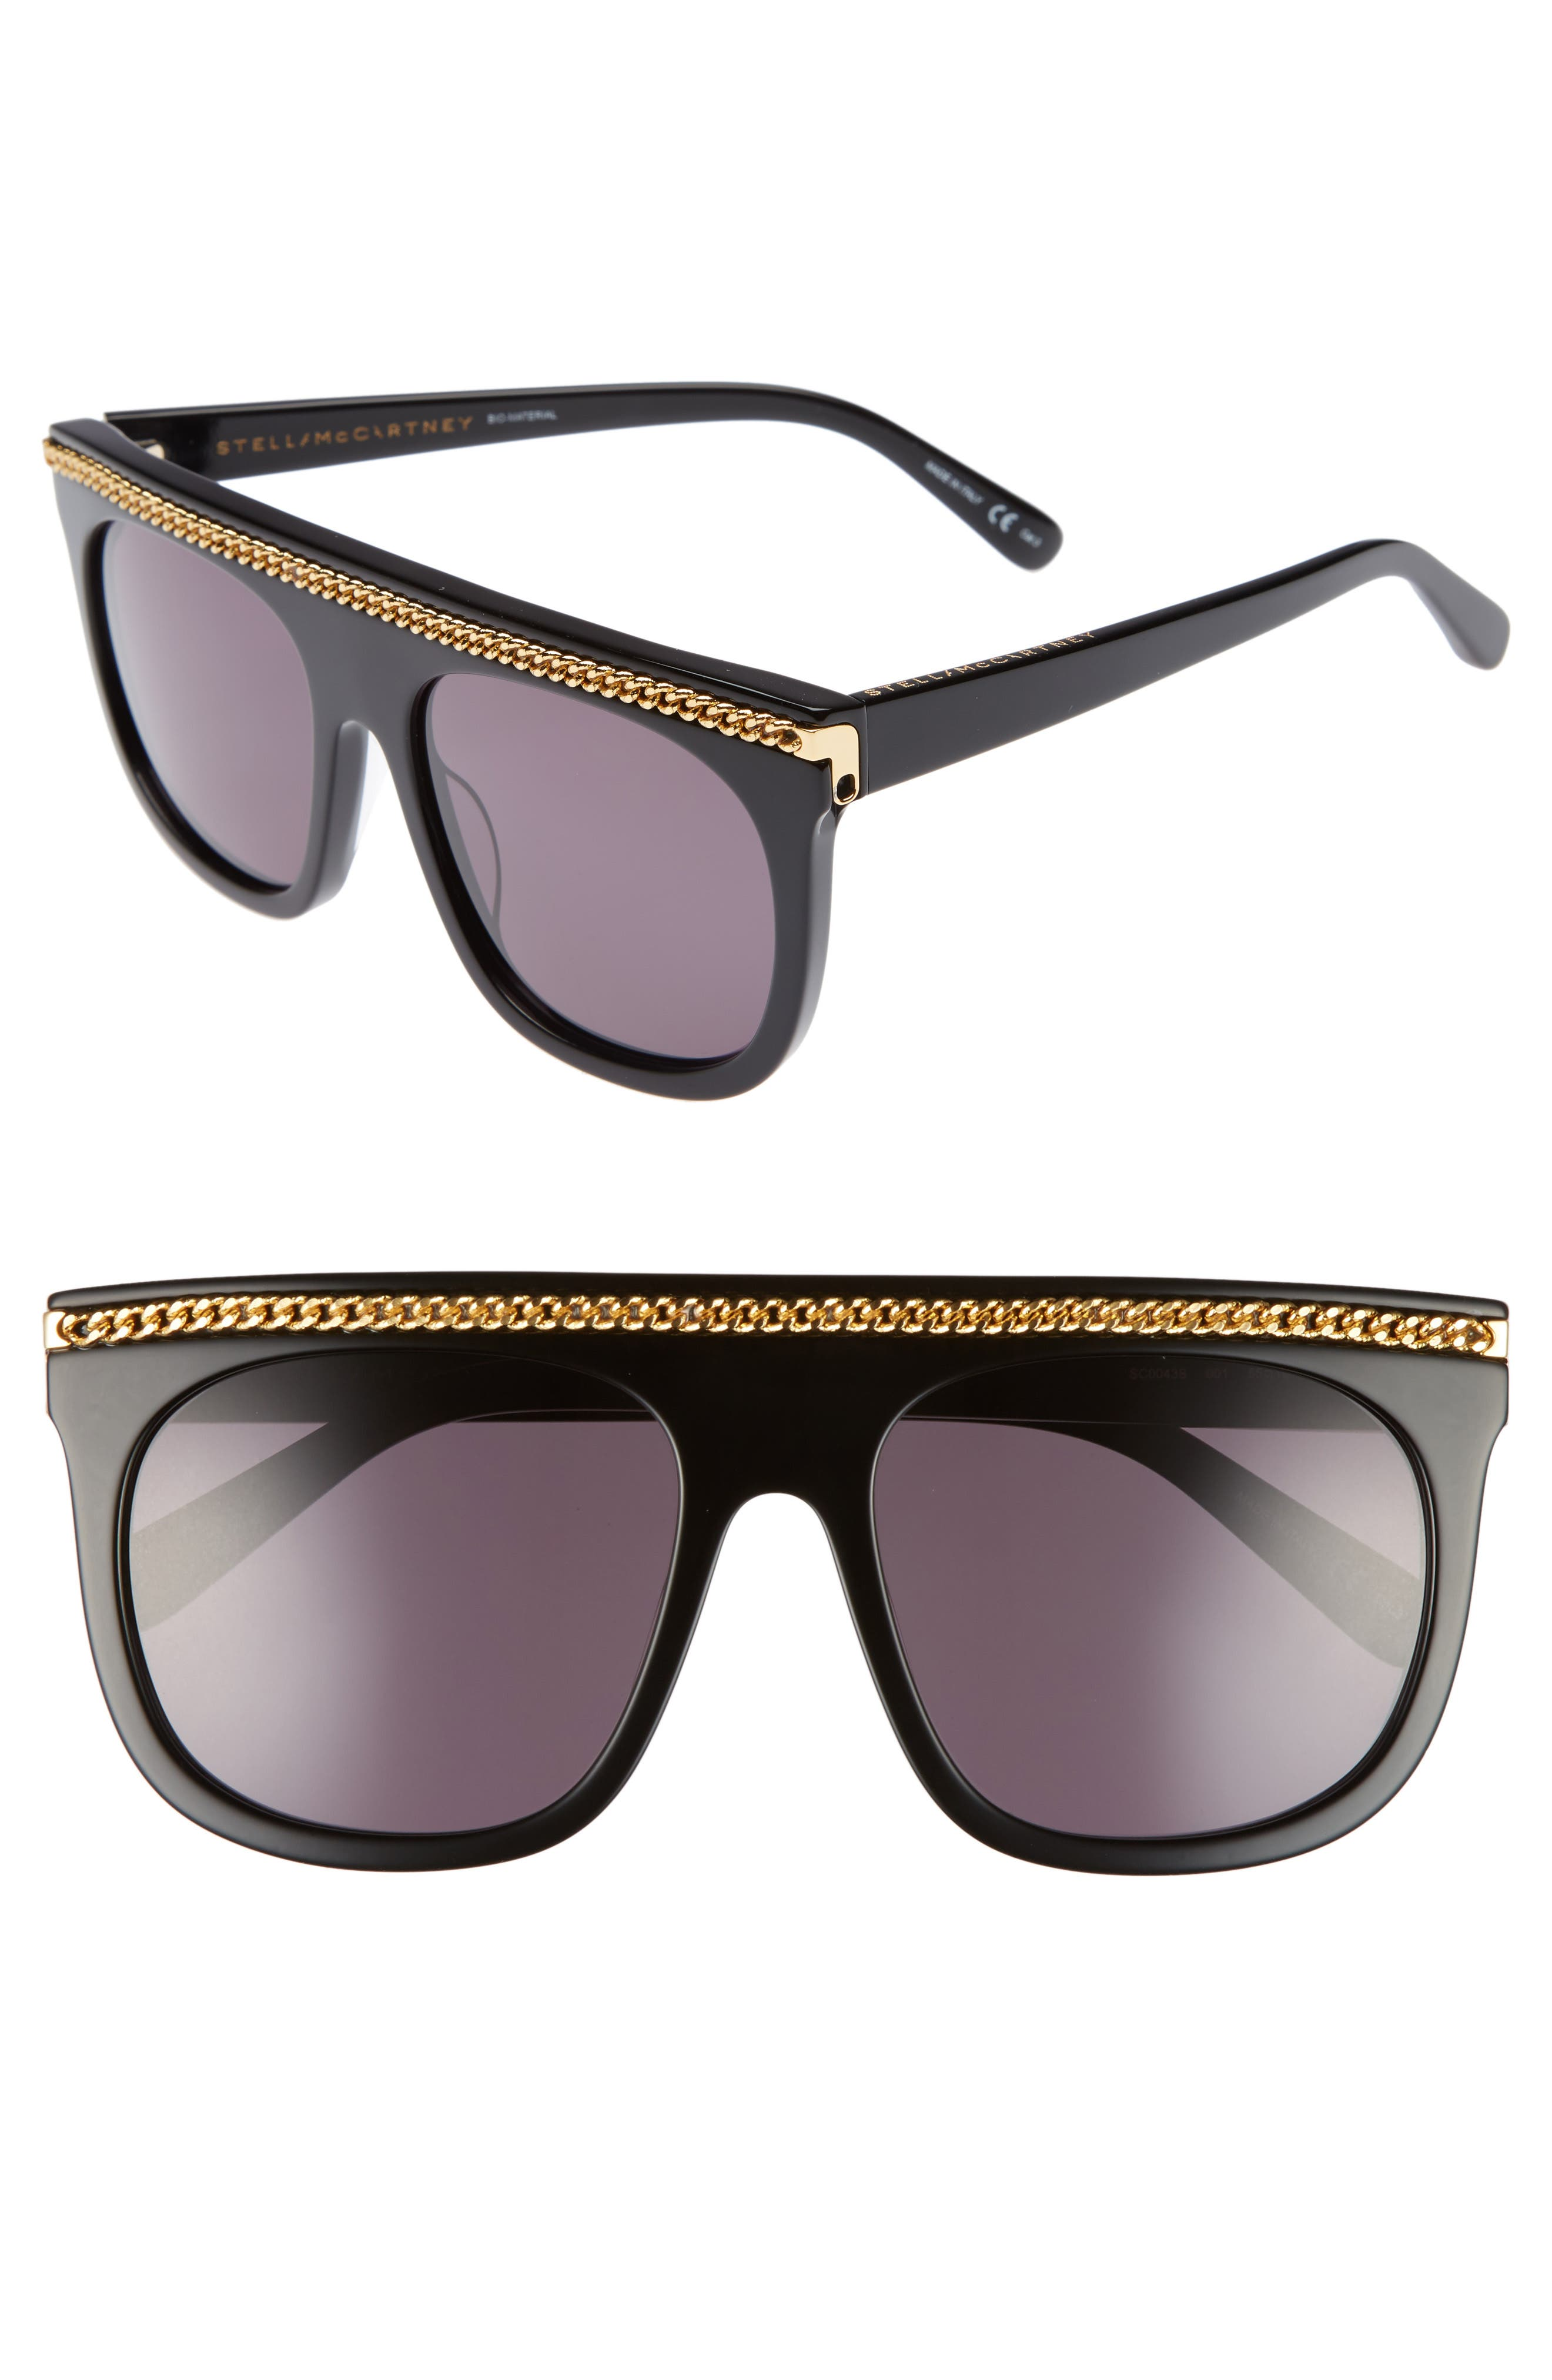 Main Image - Stella McCartney 55mm Flat Top Sunglasses